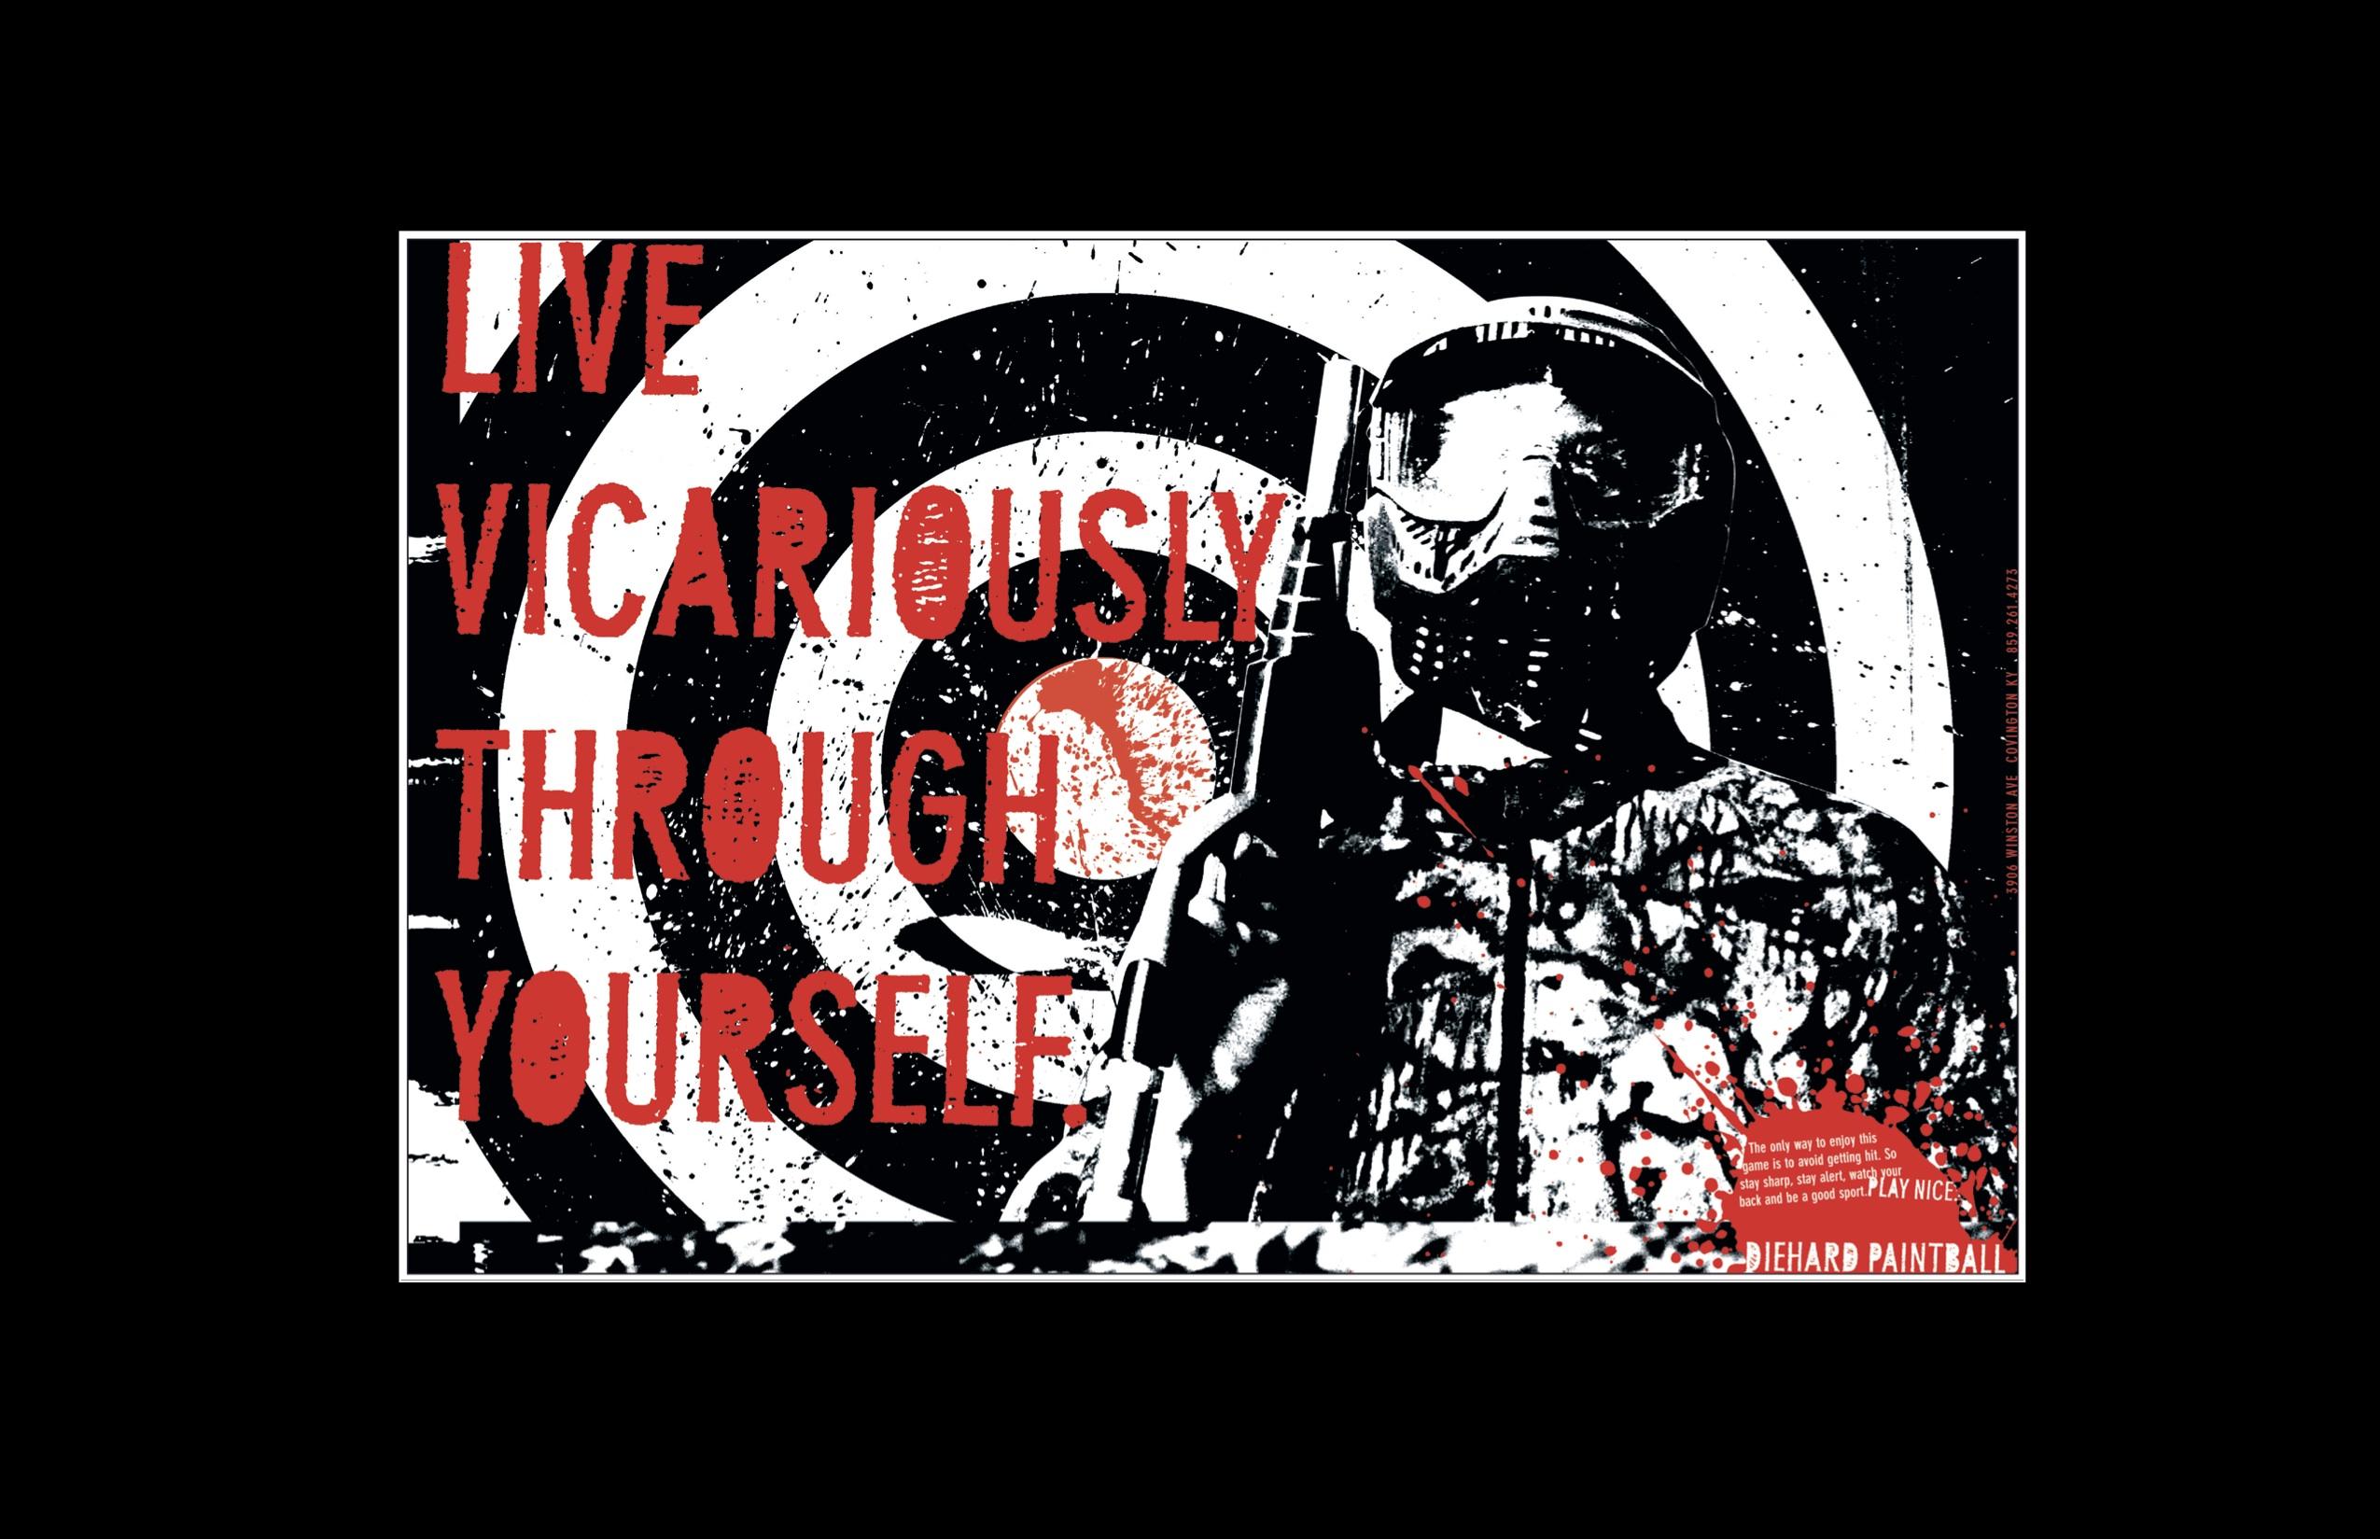 DHPB-Live vicariously